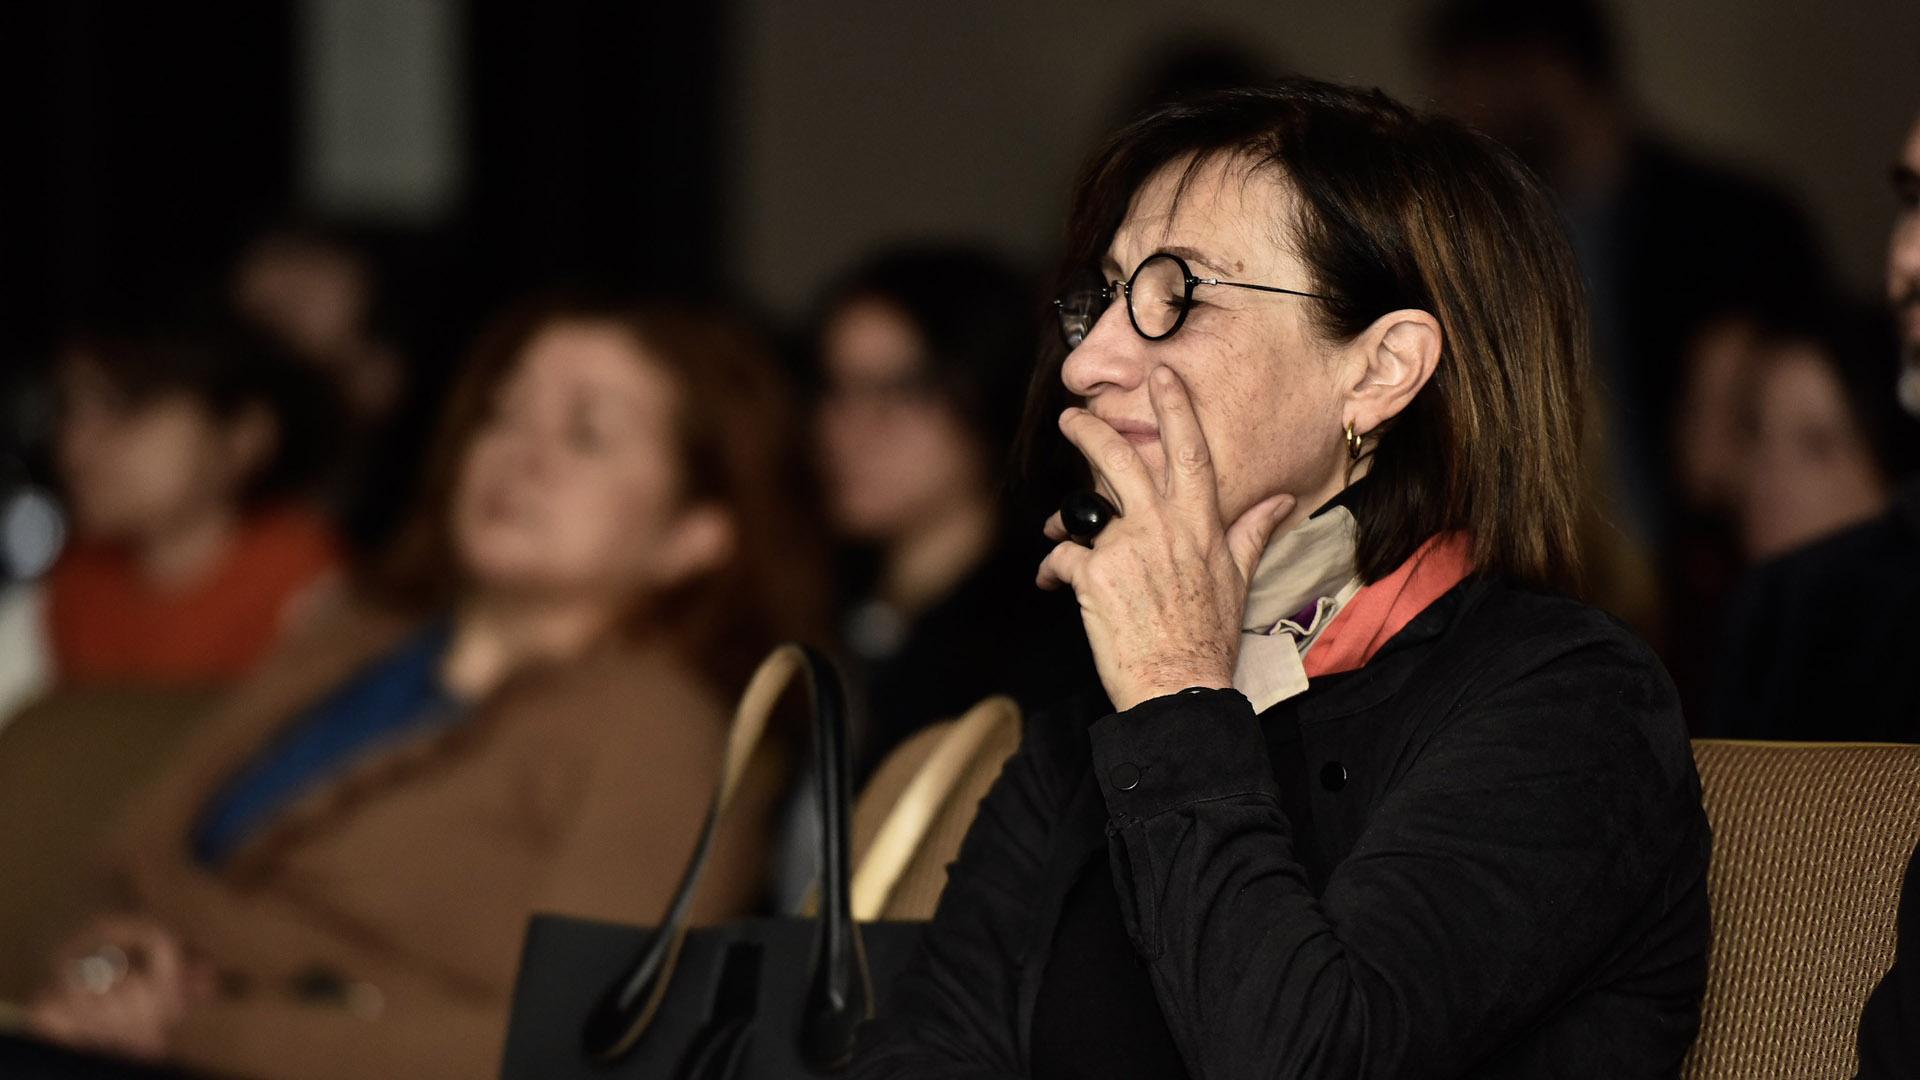 La arquitecta Mónica Kucher, dueña de Arquimadera.